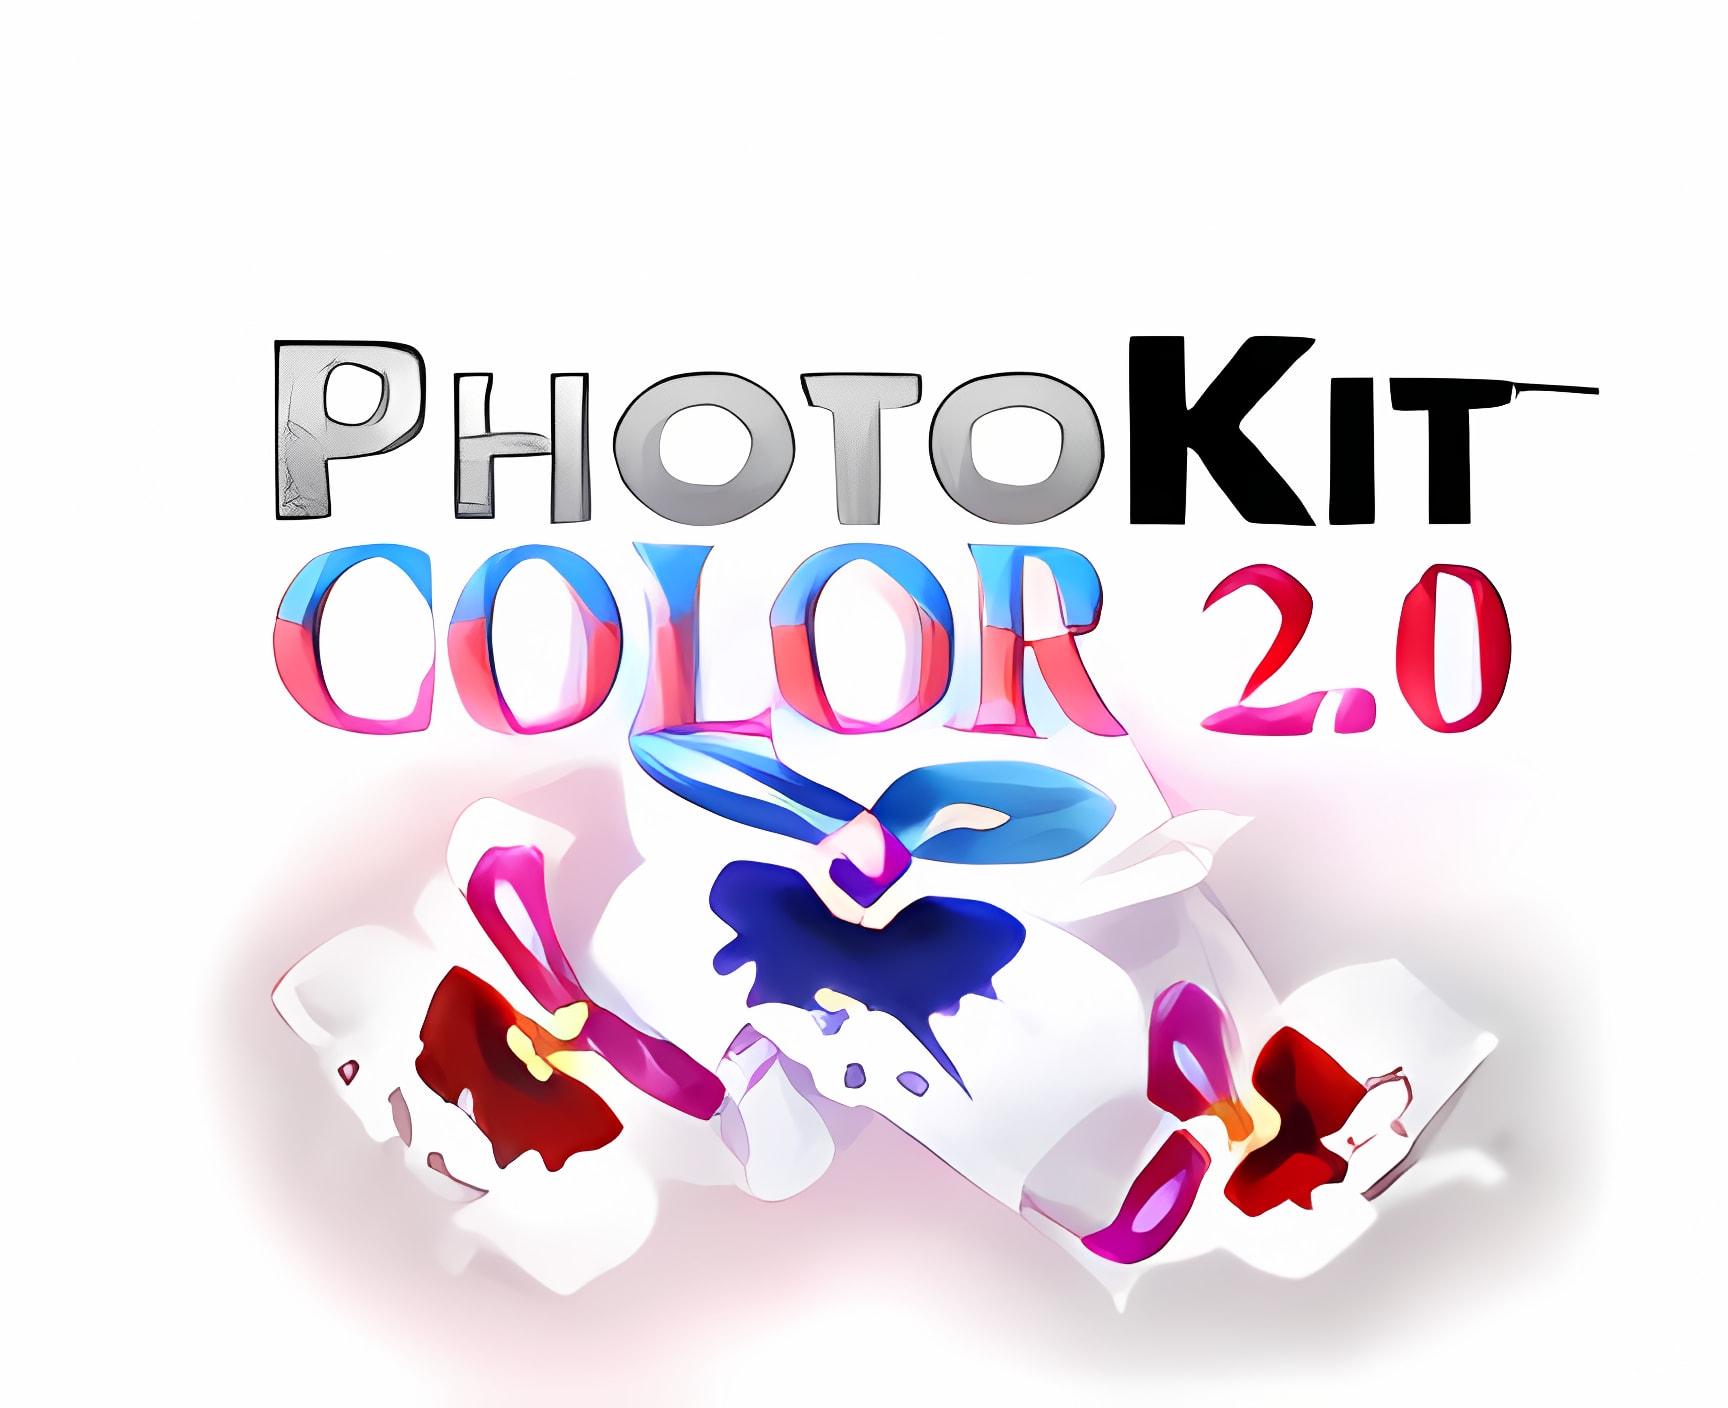 PhotoKit Color